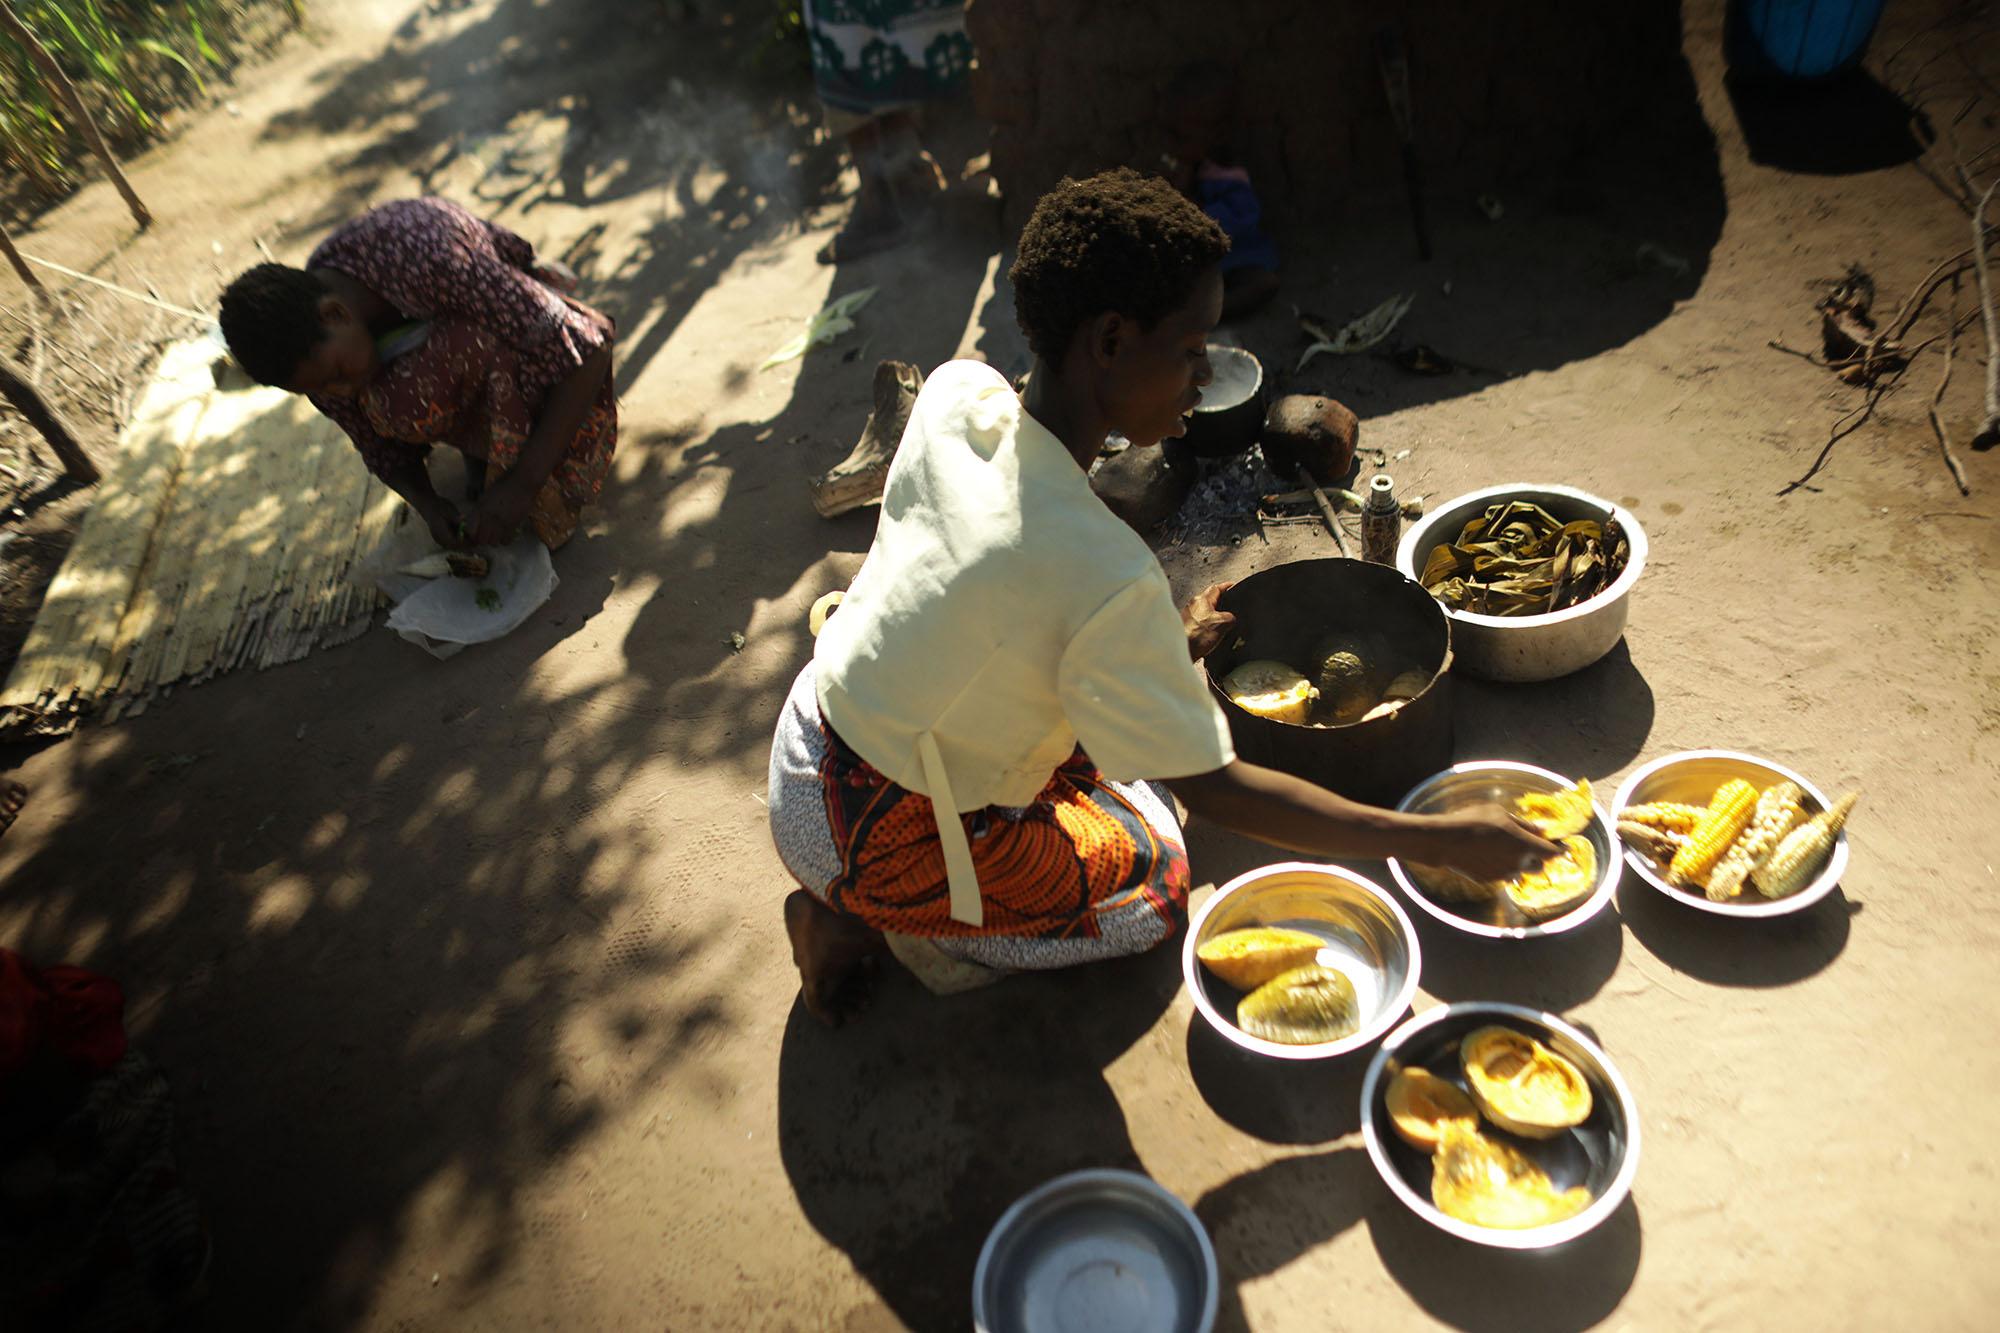 A woman prepares food near Mariam Chinguwo's house. Photo by Josh Estey